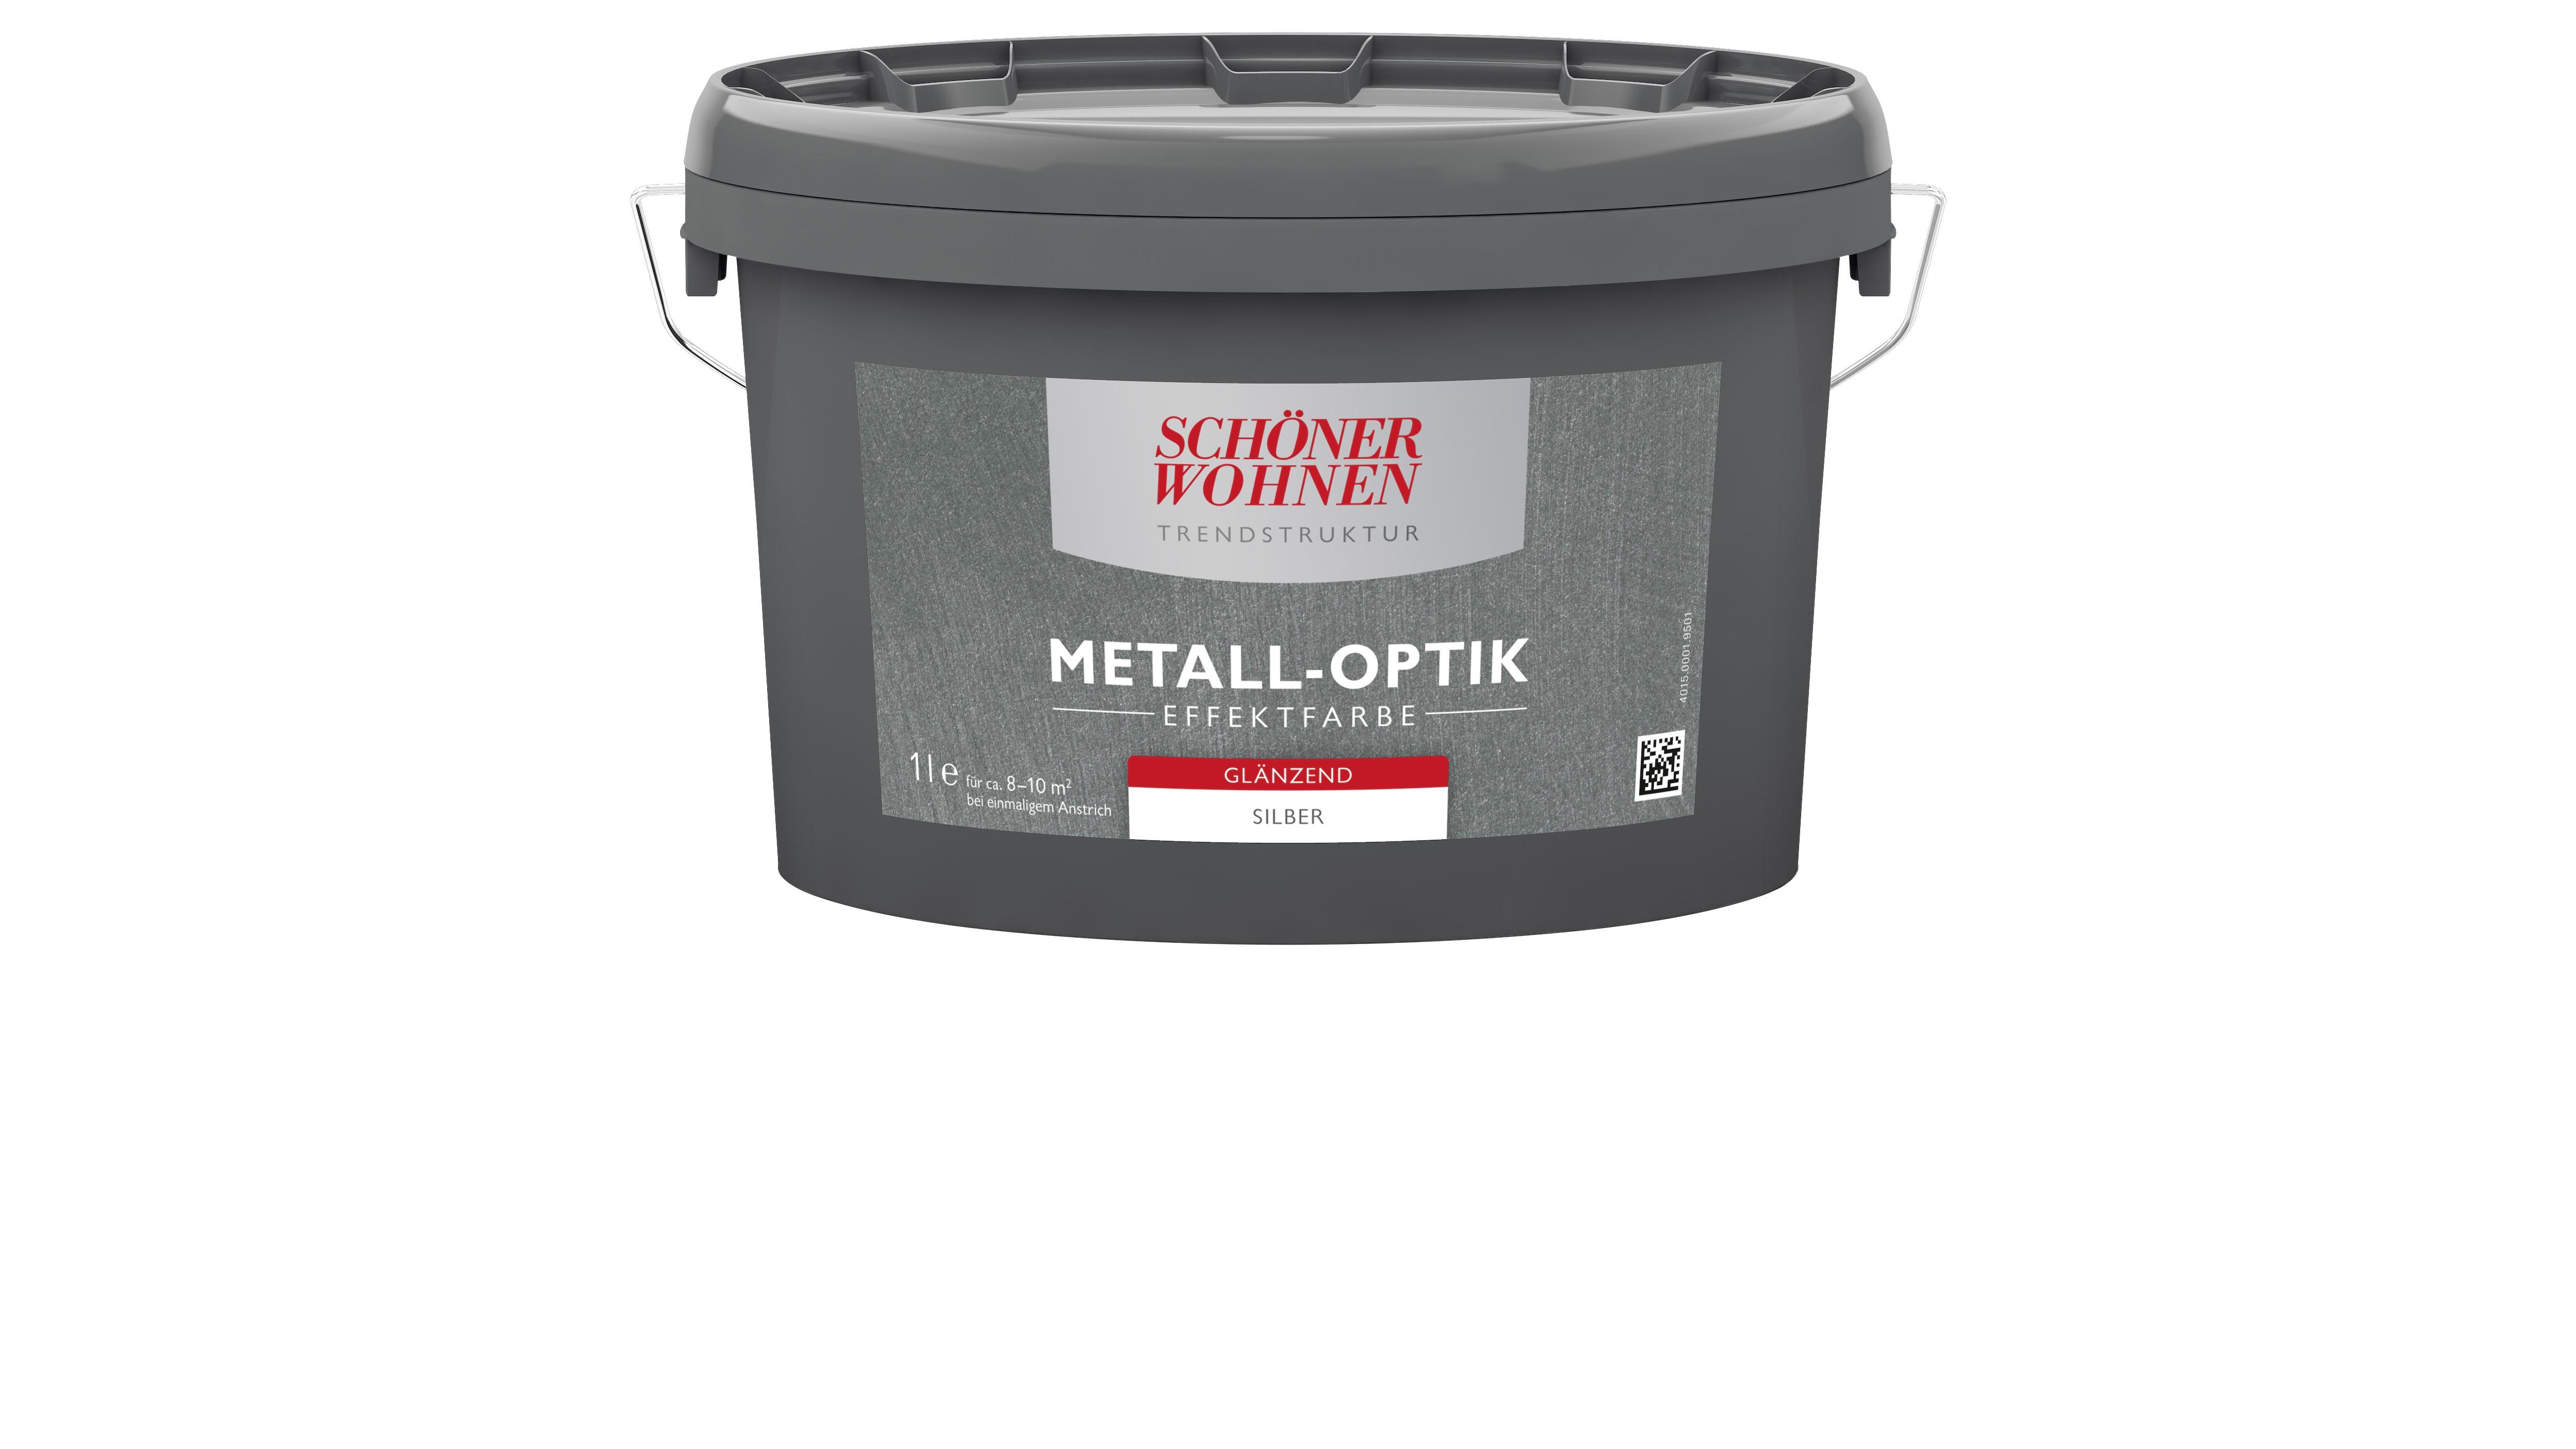 Trendstruktur Metall-Optik glänzend silber 2,5L